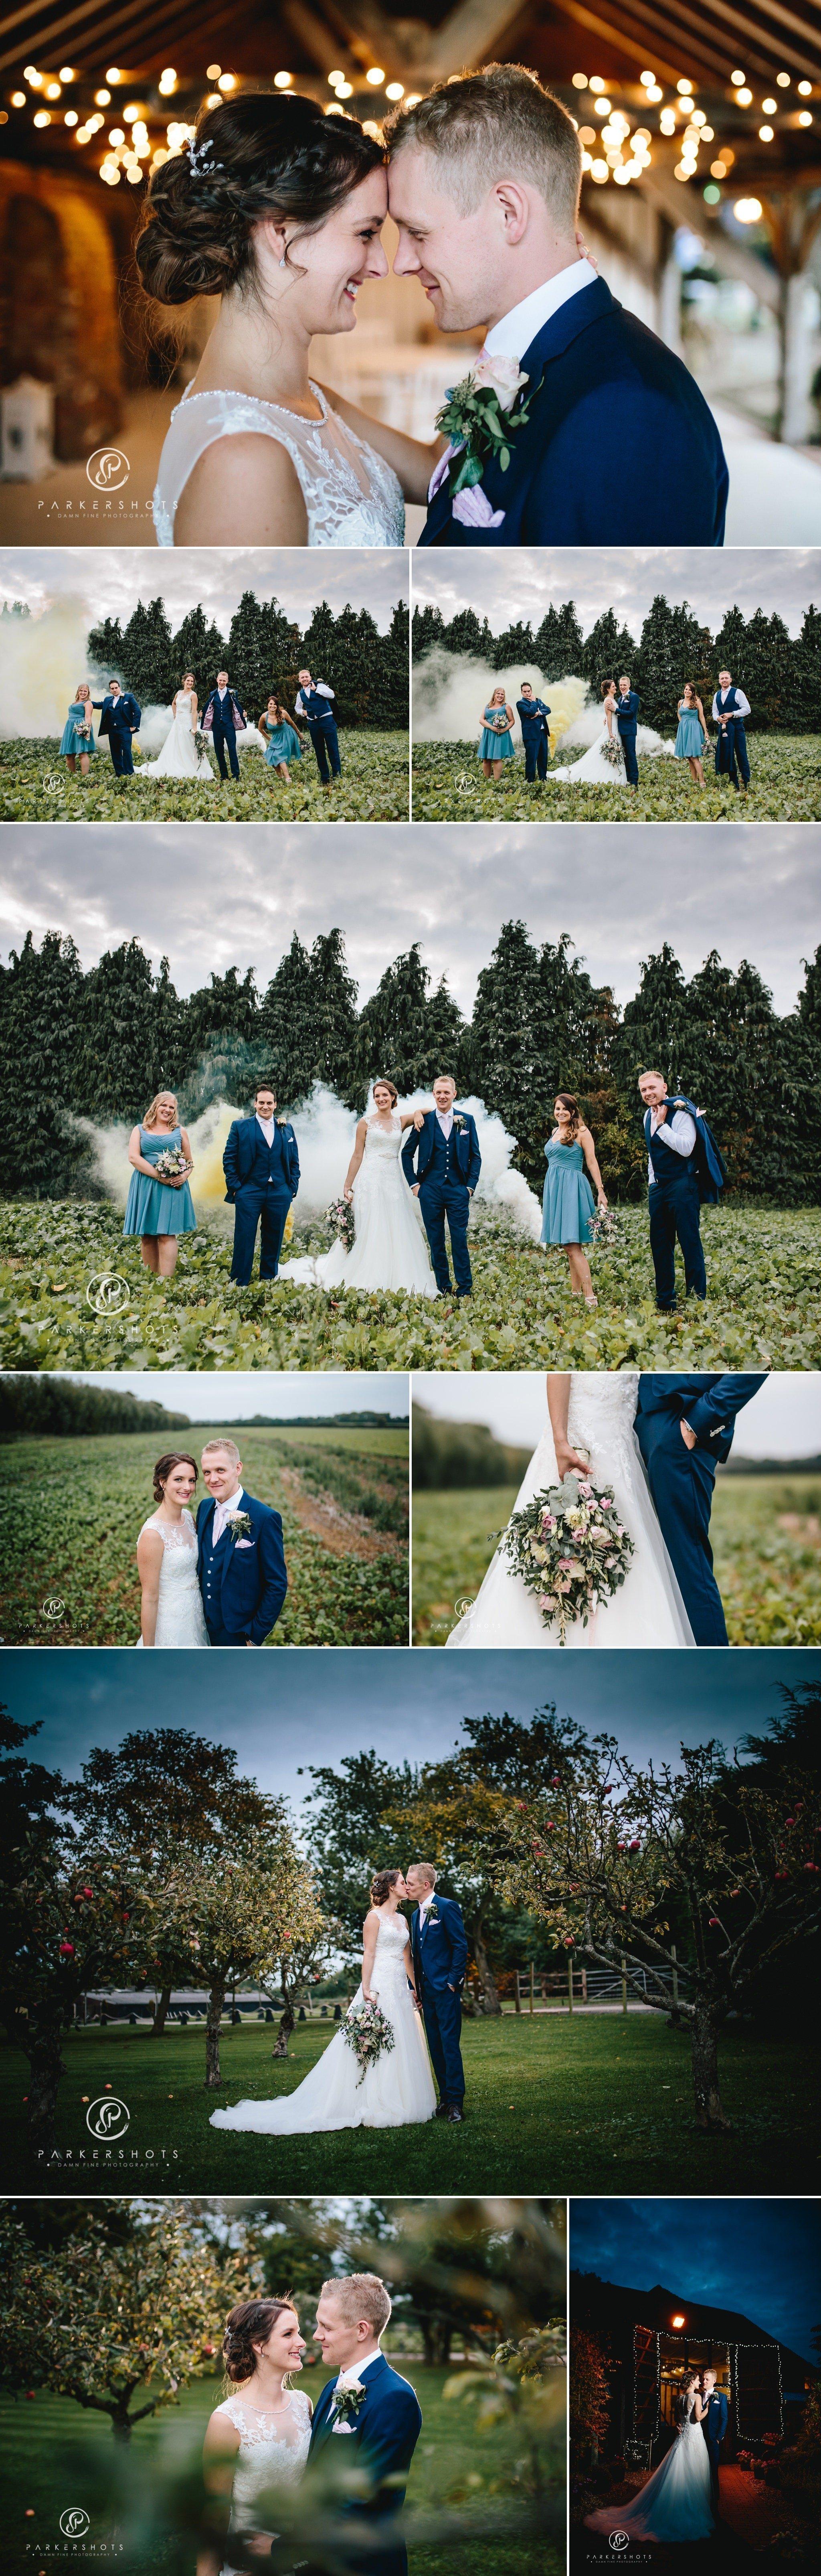 Alternative wedding photography at Winters Barns